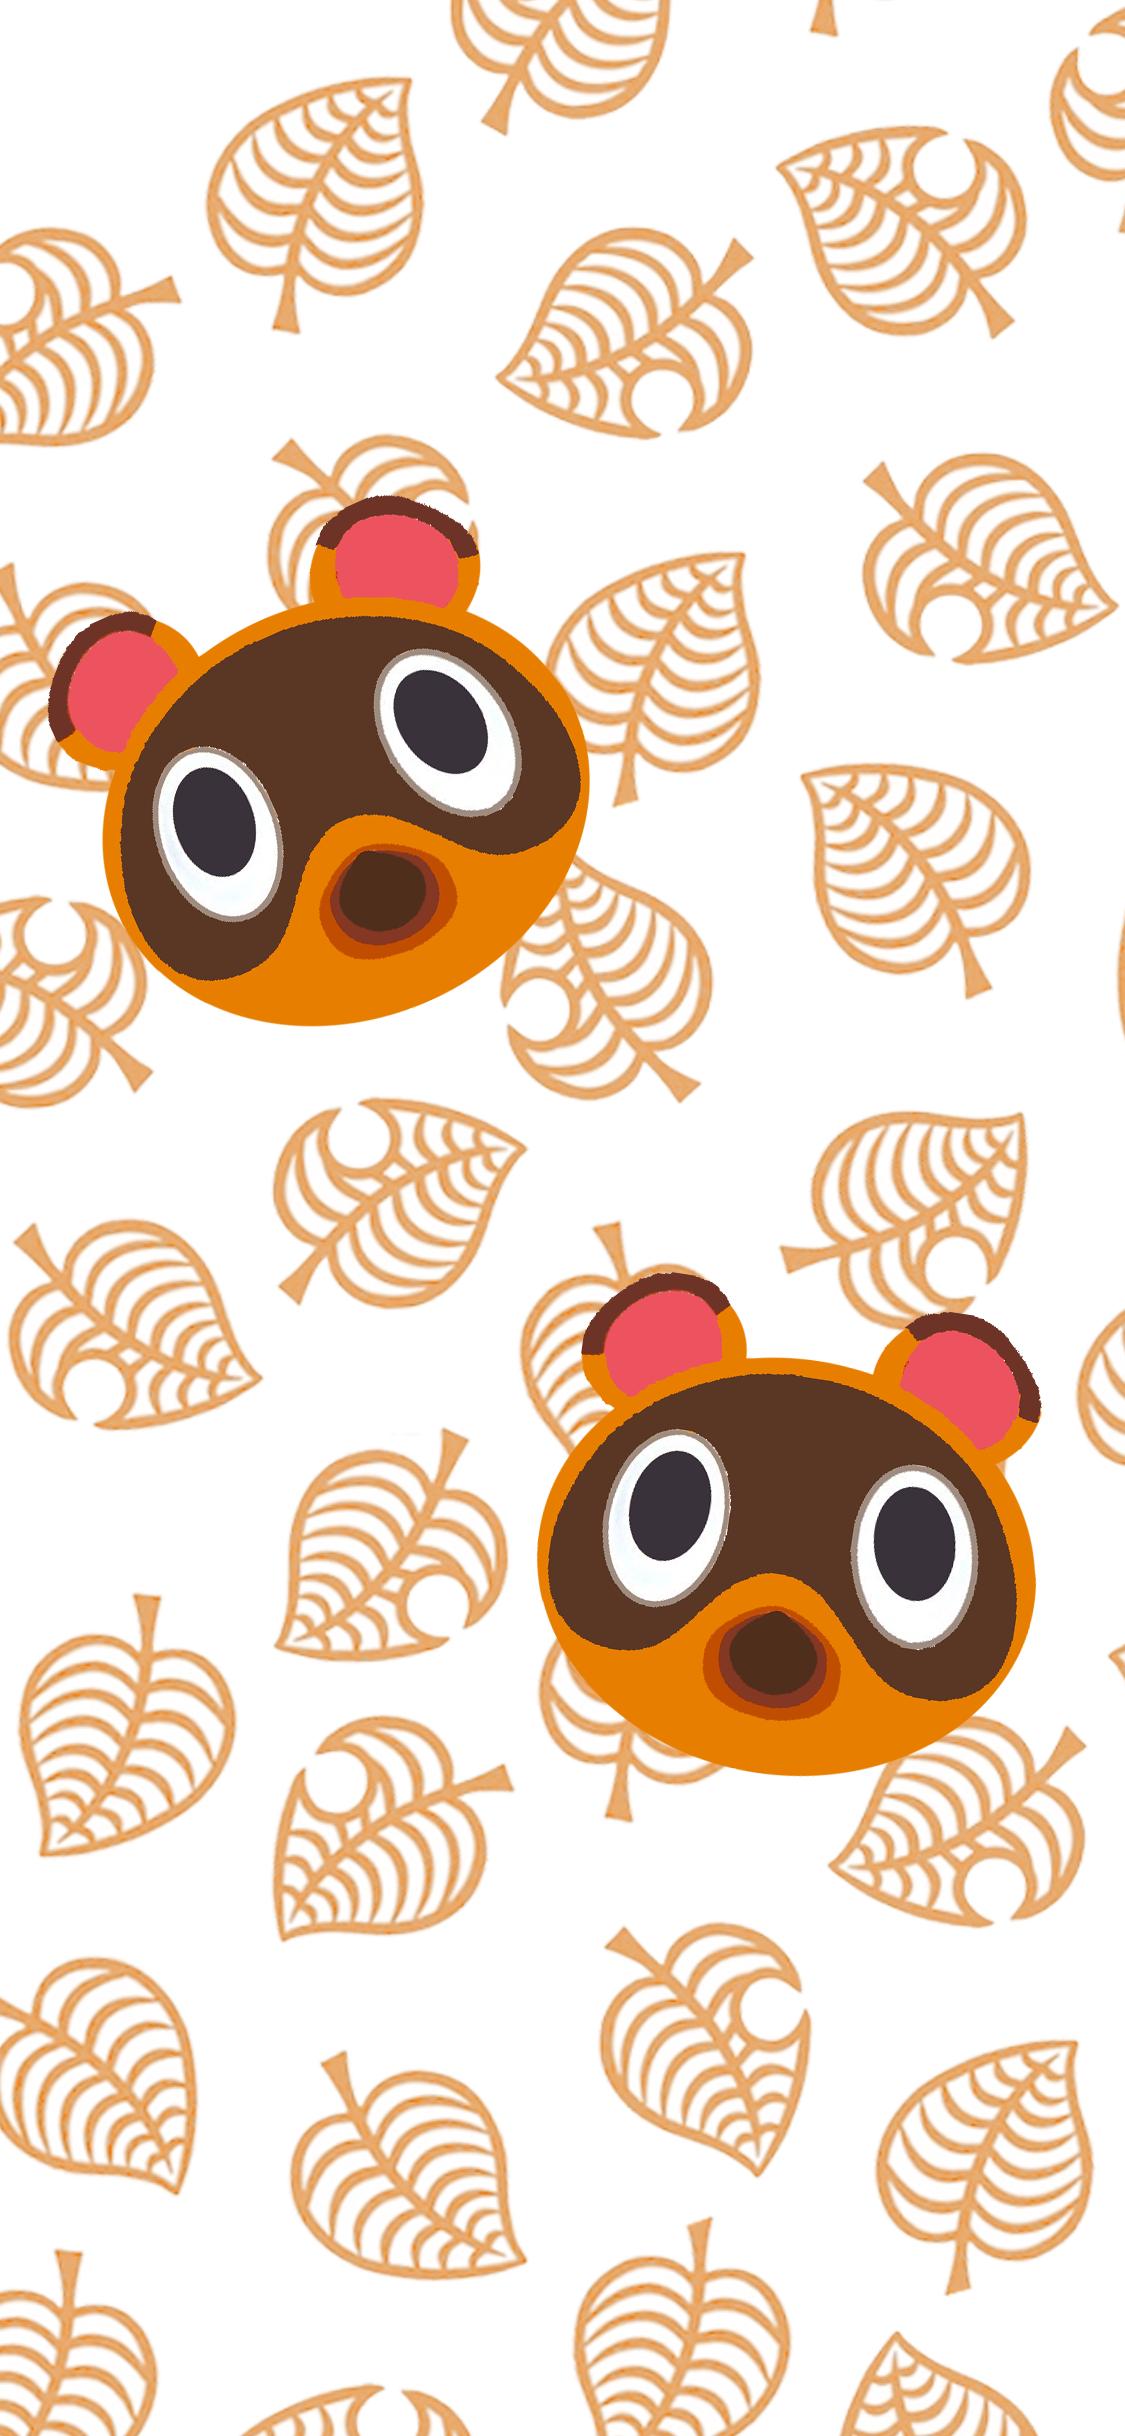 Animal Crossing New Horizons Mobile And Desktop Wallpapers Acpocketnews In 2020 Animal Crossing Animal Crossing Characters Animal Crossing Leaf